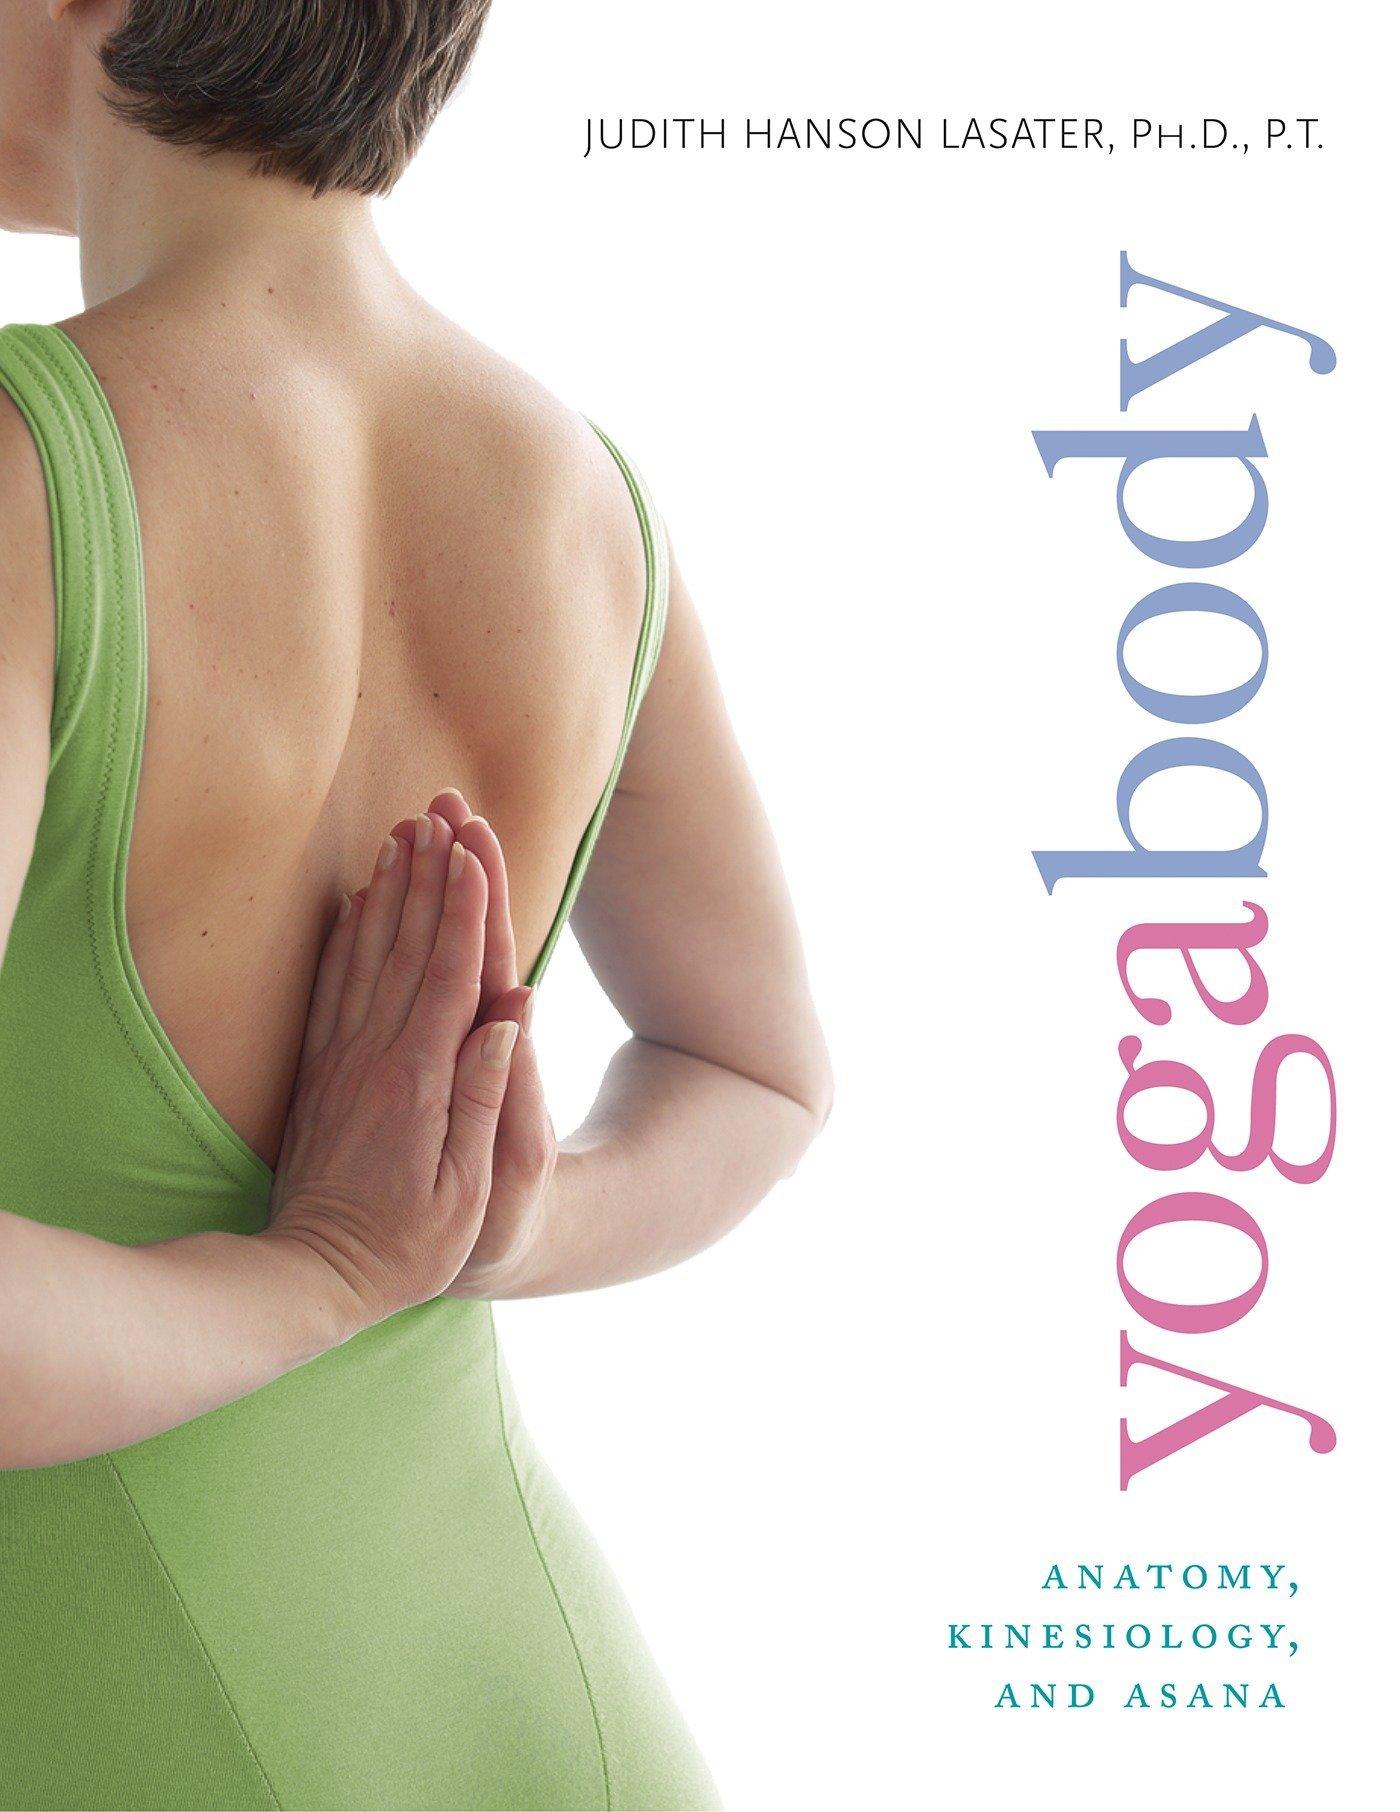 yogabody-anatomy-kinesiology-and-asana